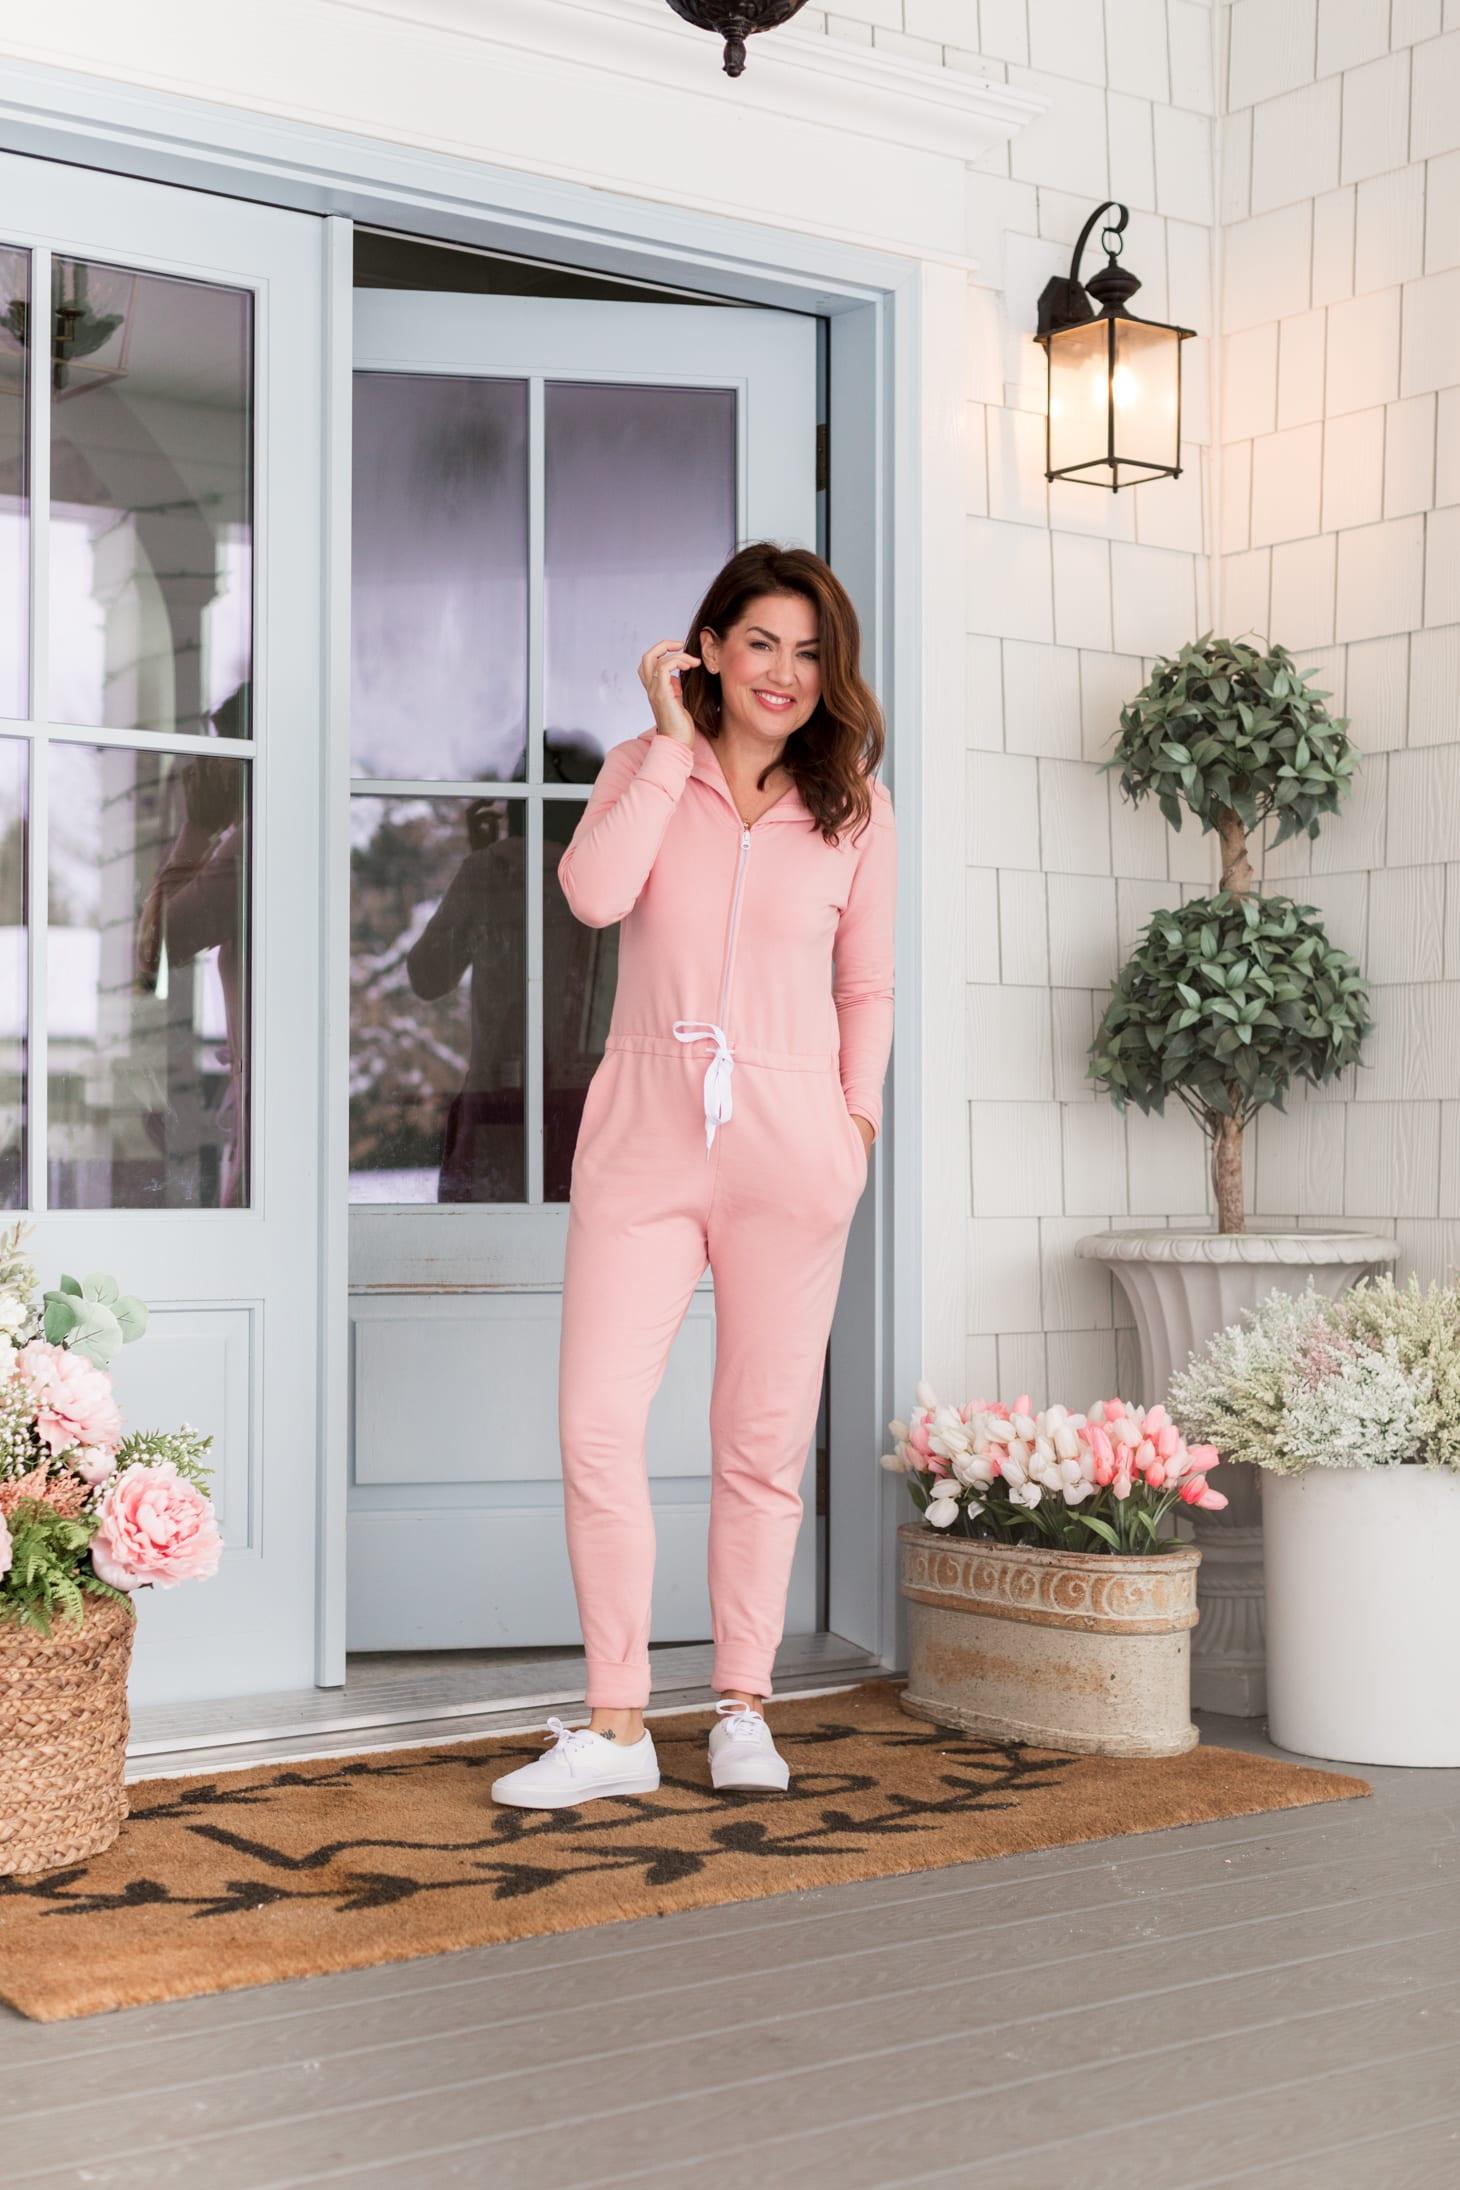 Jillian Harris Spring 2020 Jilly Box Launches Tomorrow